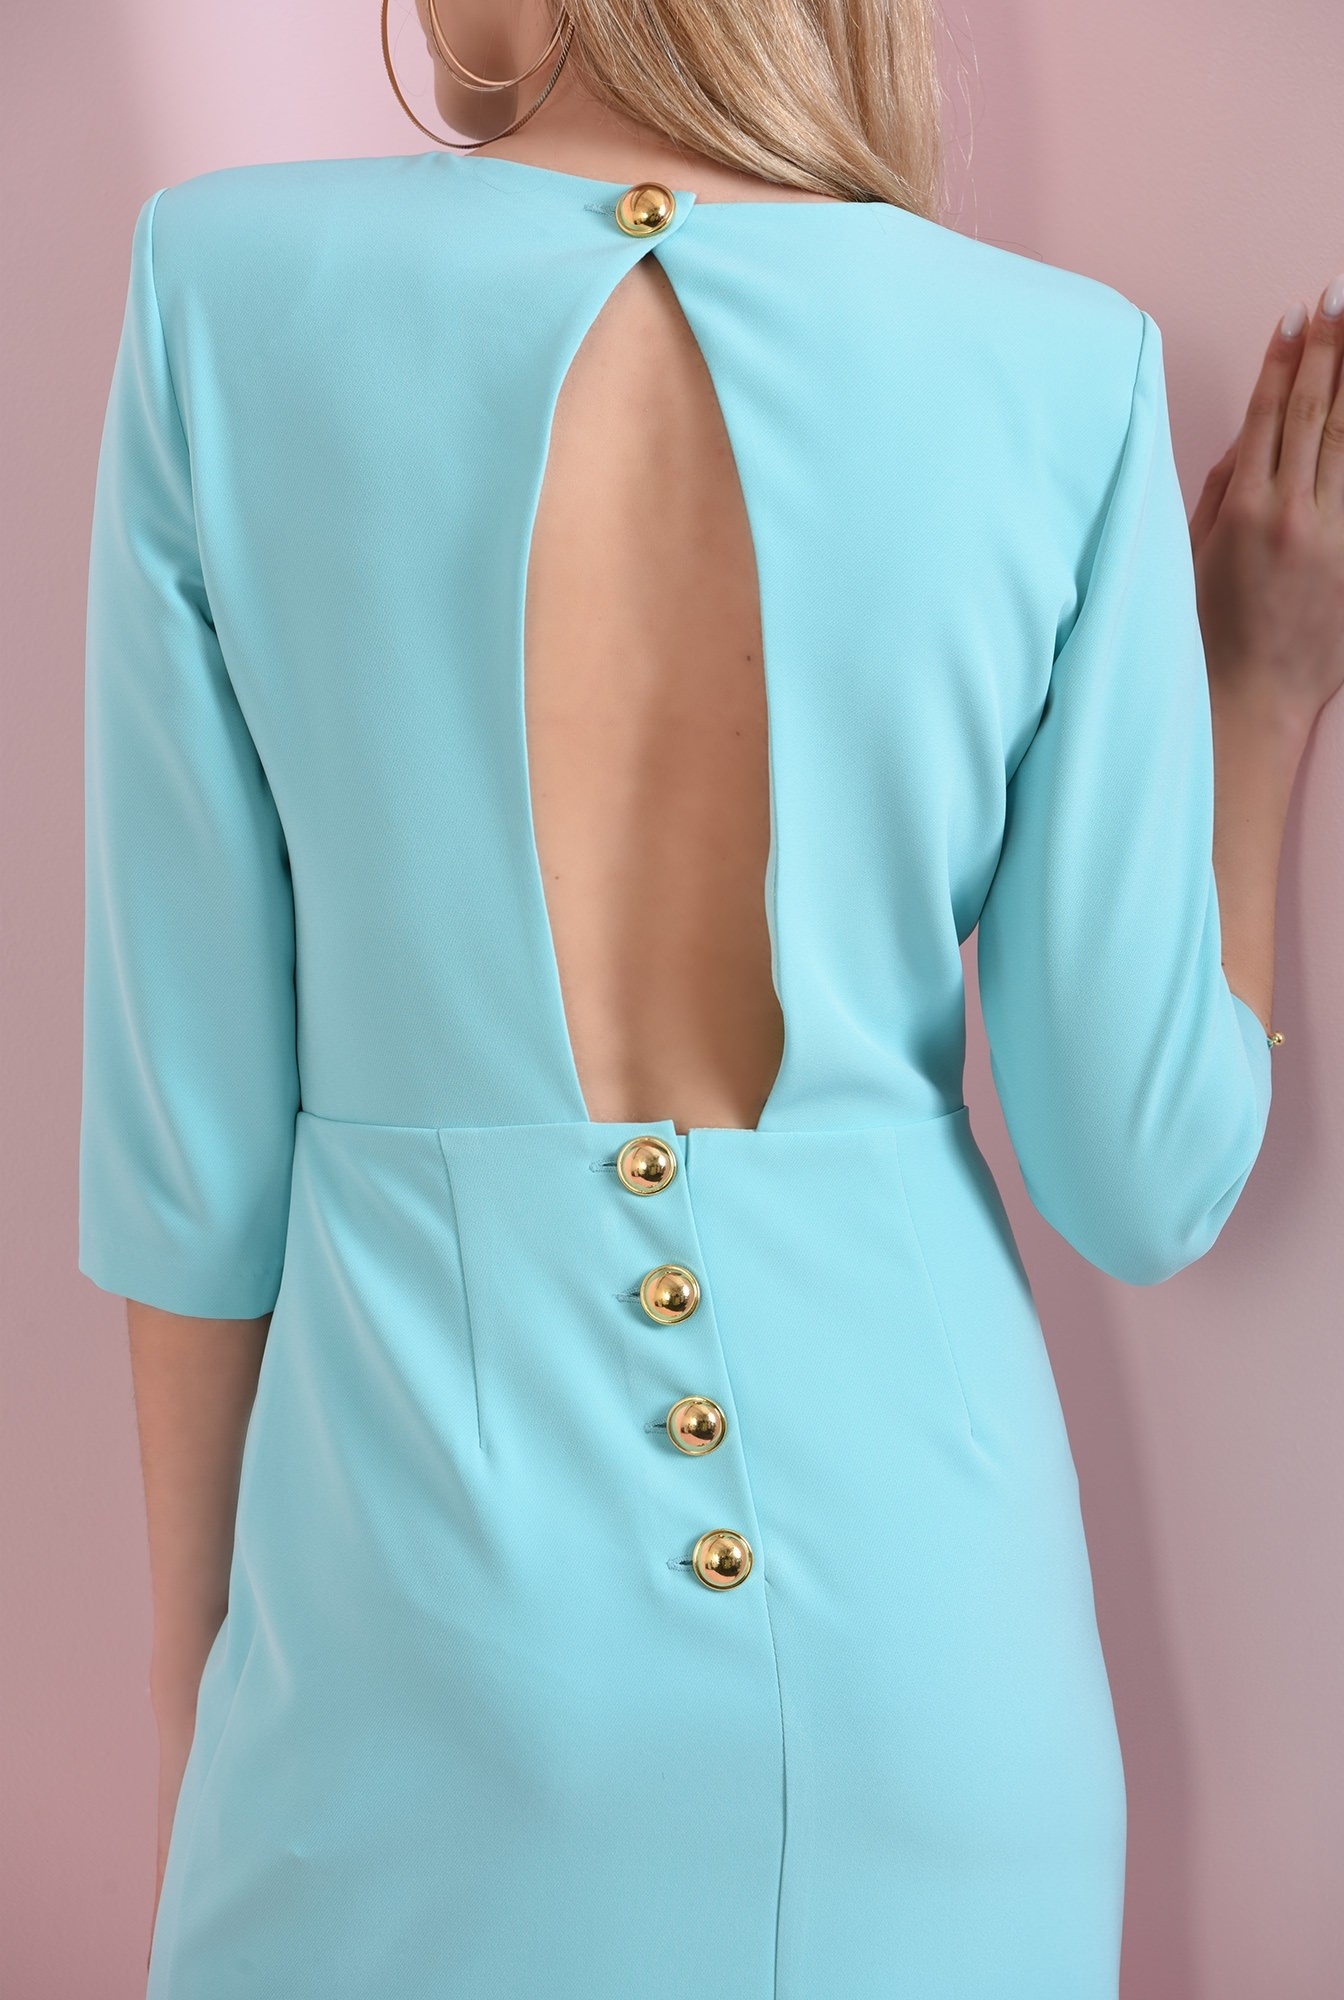 1 - 360 - rochie mini, turcoaz, cu decupaj